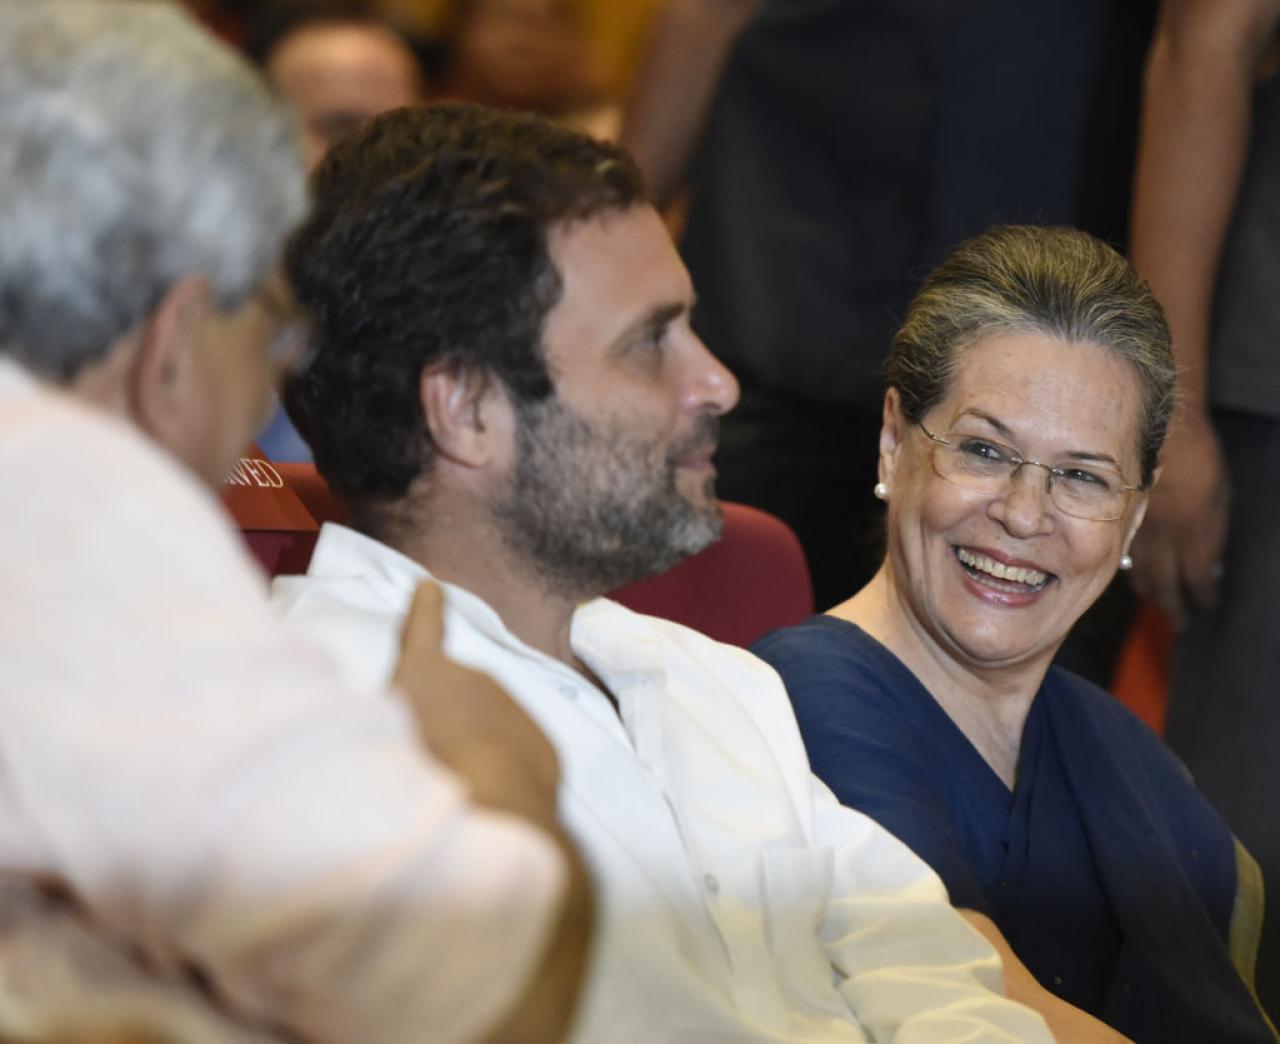 Congress vice-president Rahul Gandhi, centre, and Congress president Sonia Gandhi, right, talking to CPI (M) leader Sitaram Yechury.  (Sonu Mehta/Hindustan Times via Getty Images)